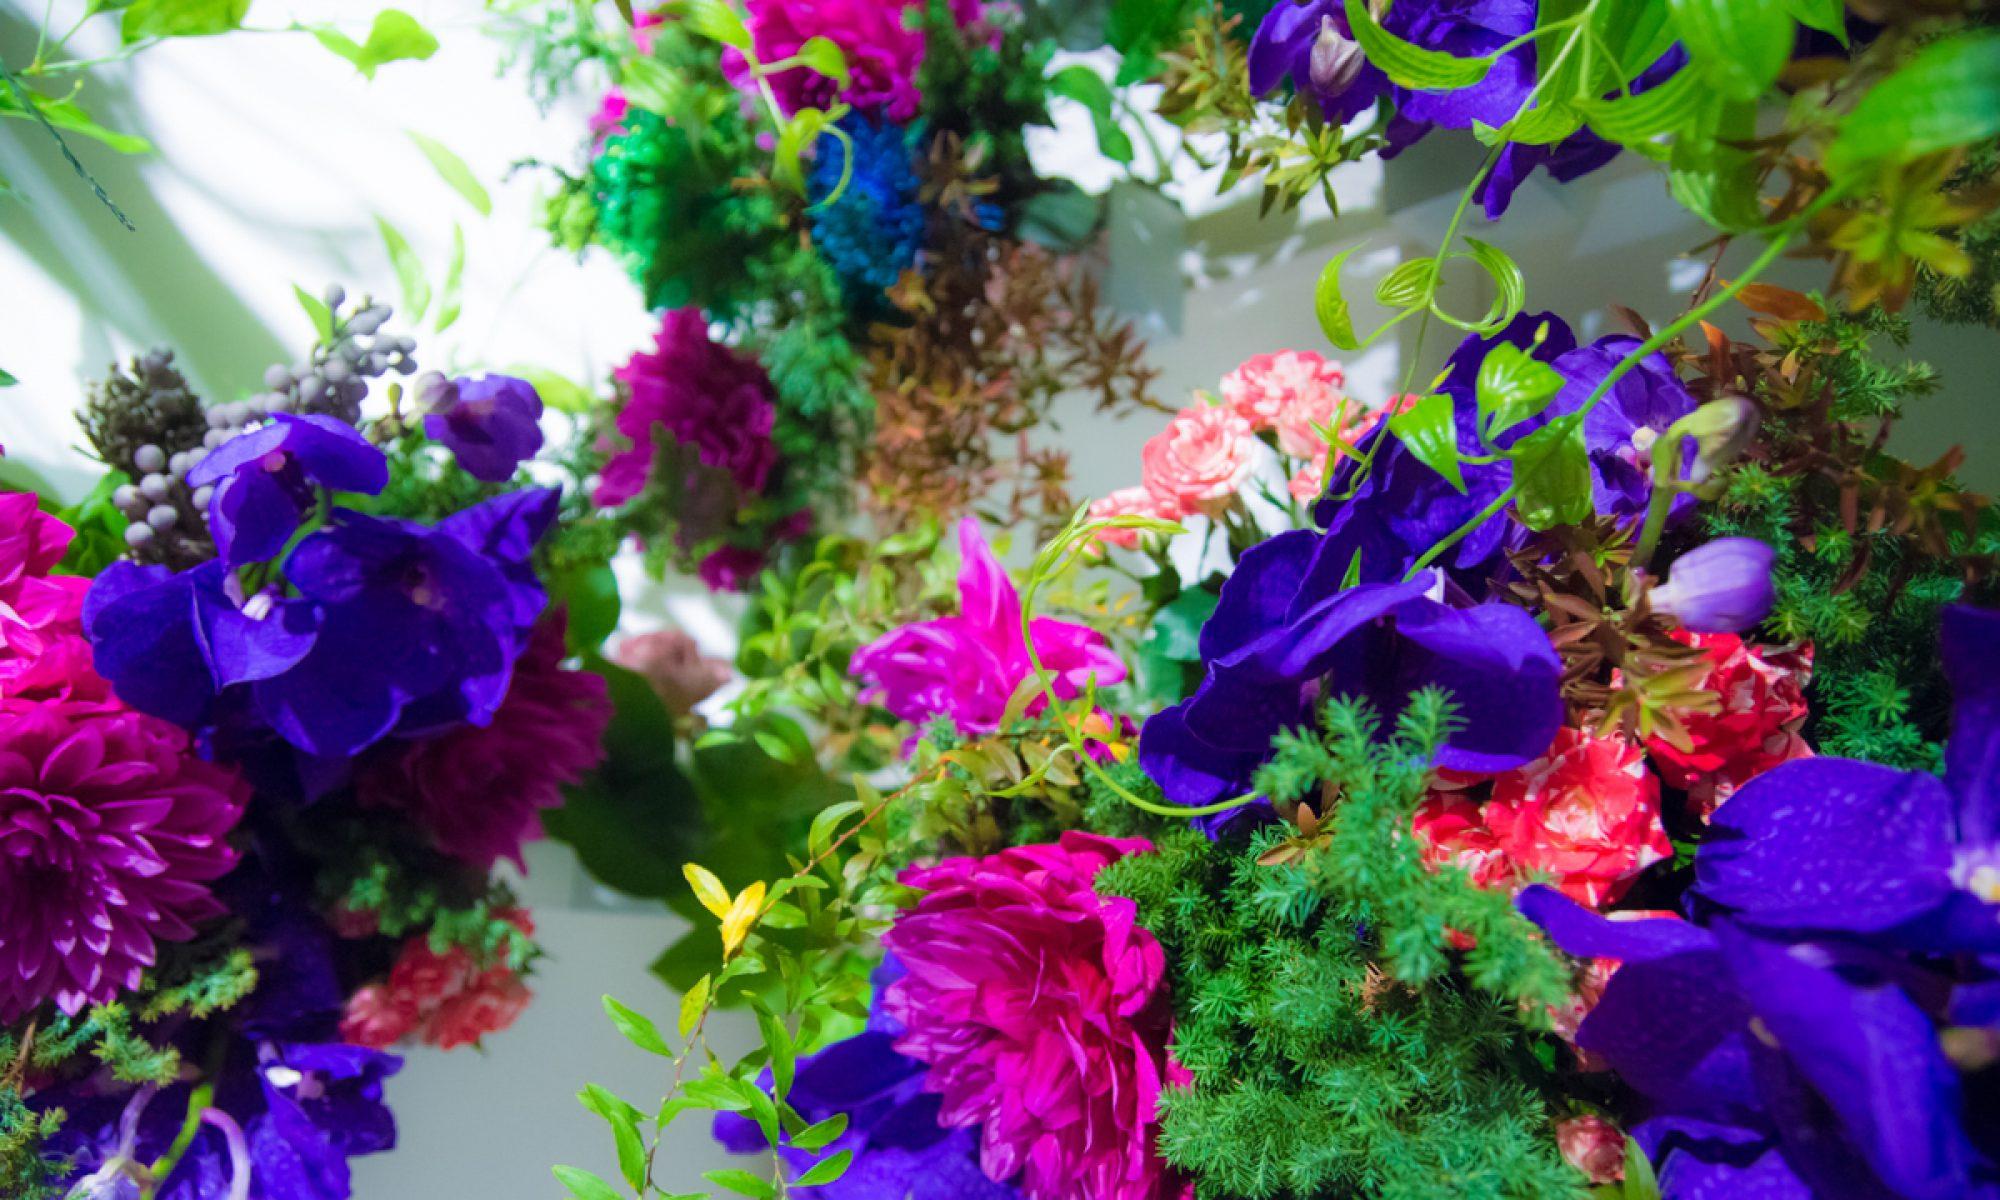 F.Insta|花と空間のアート|FlowerInstallation.com